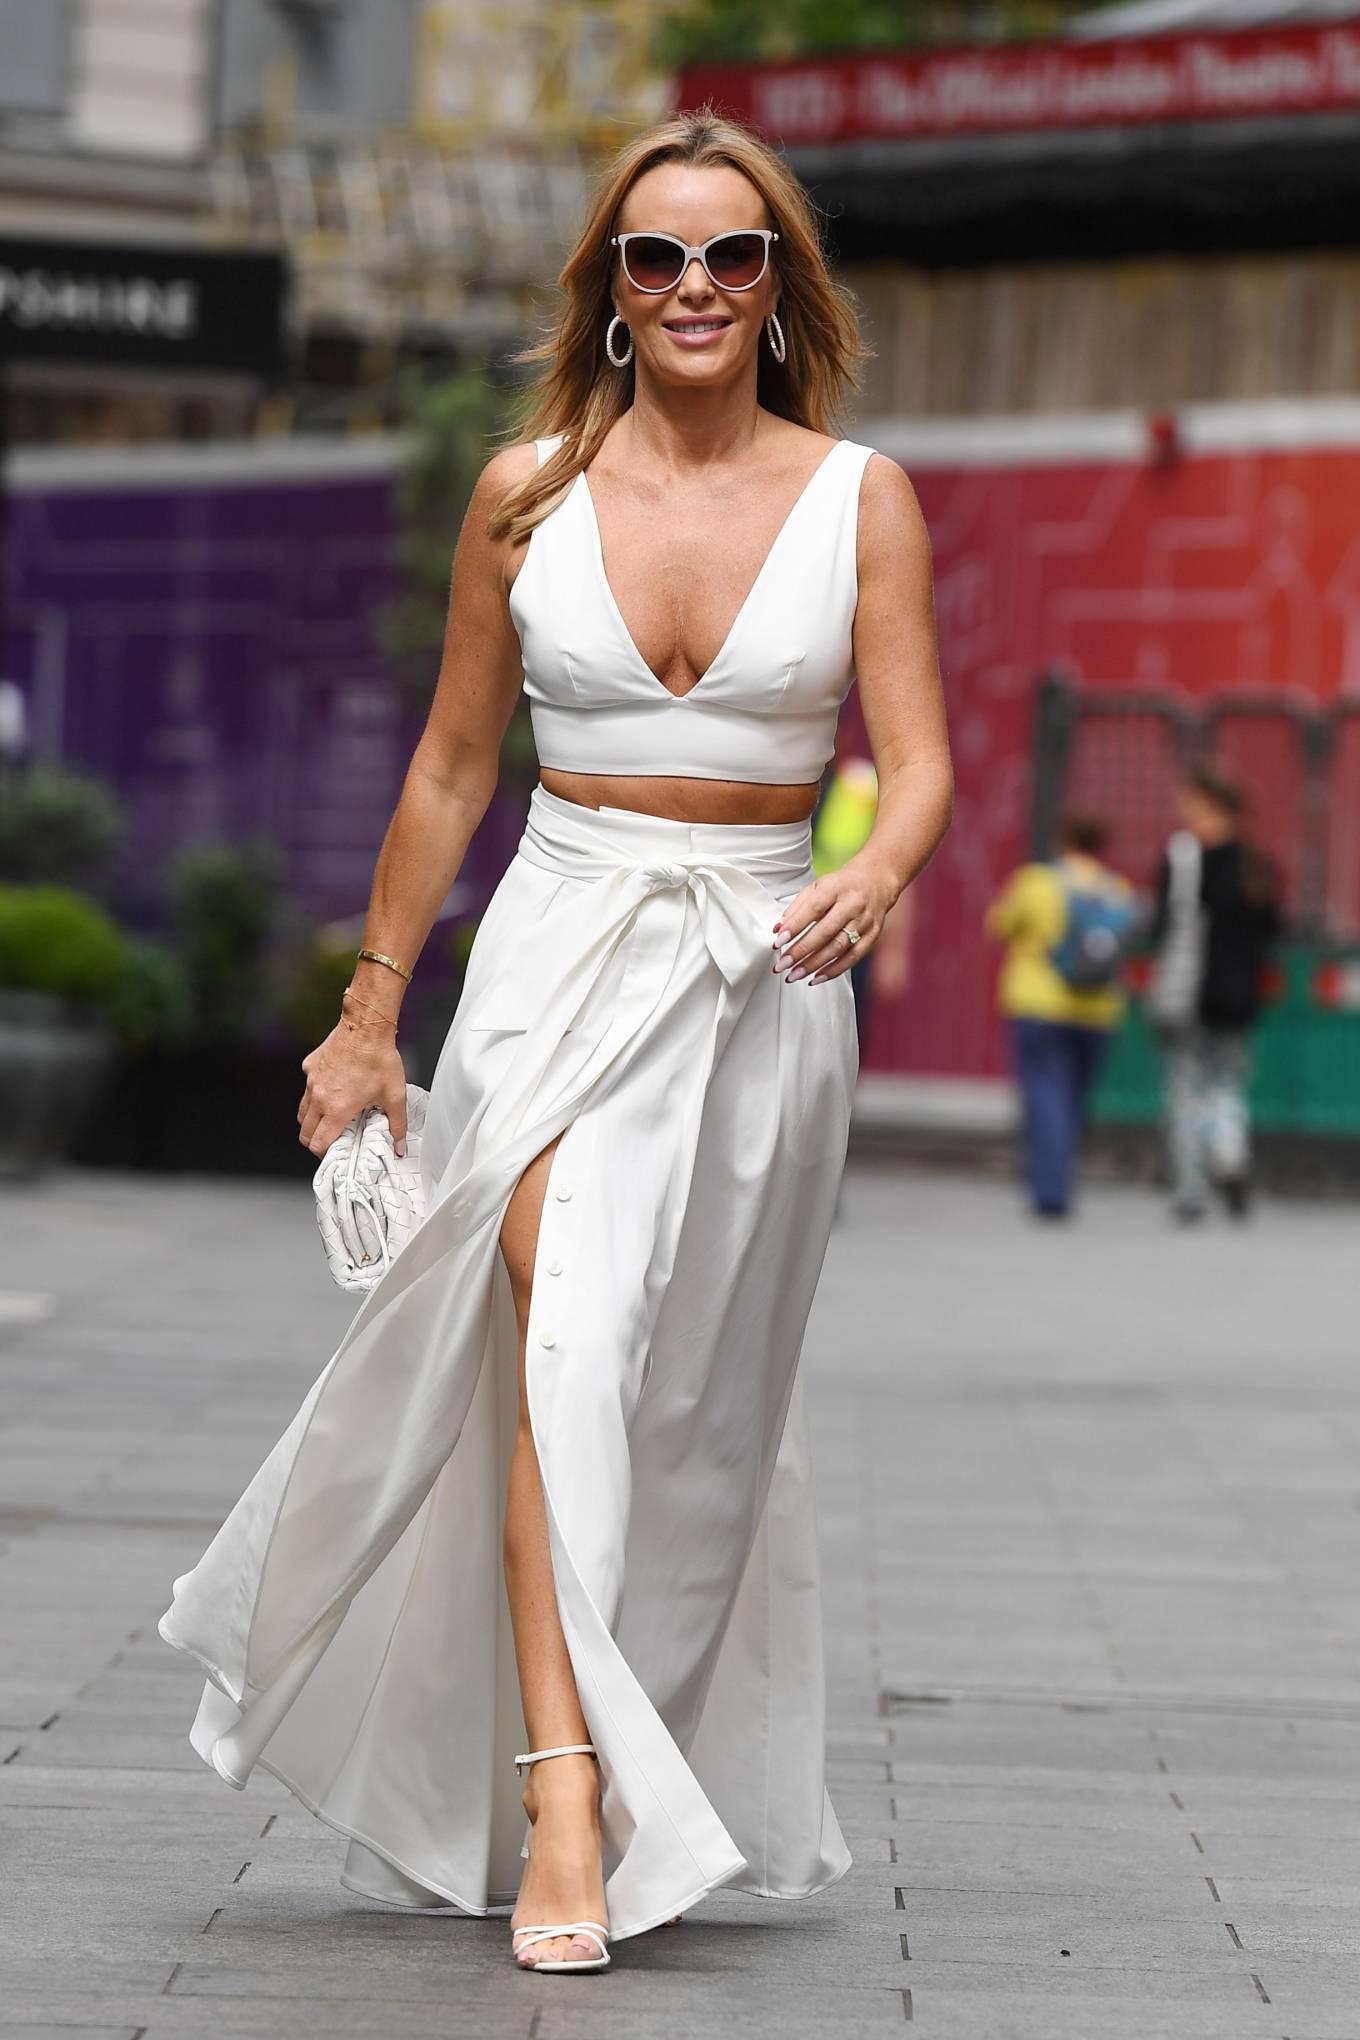 Amanda Holden 2021 : Amanda Holden – In a white dress at Global Studios in London-07